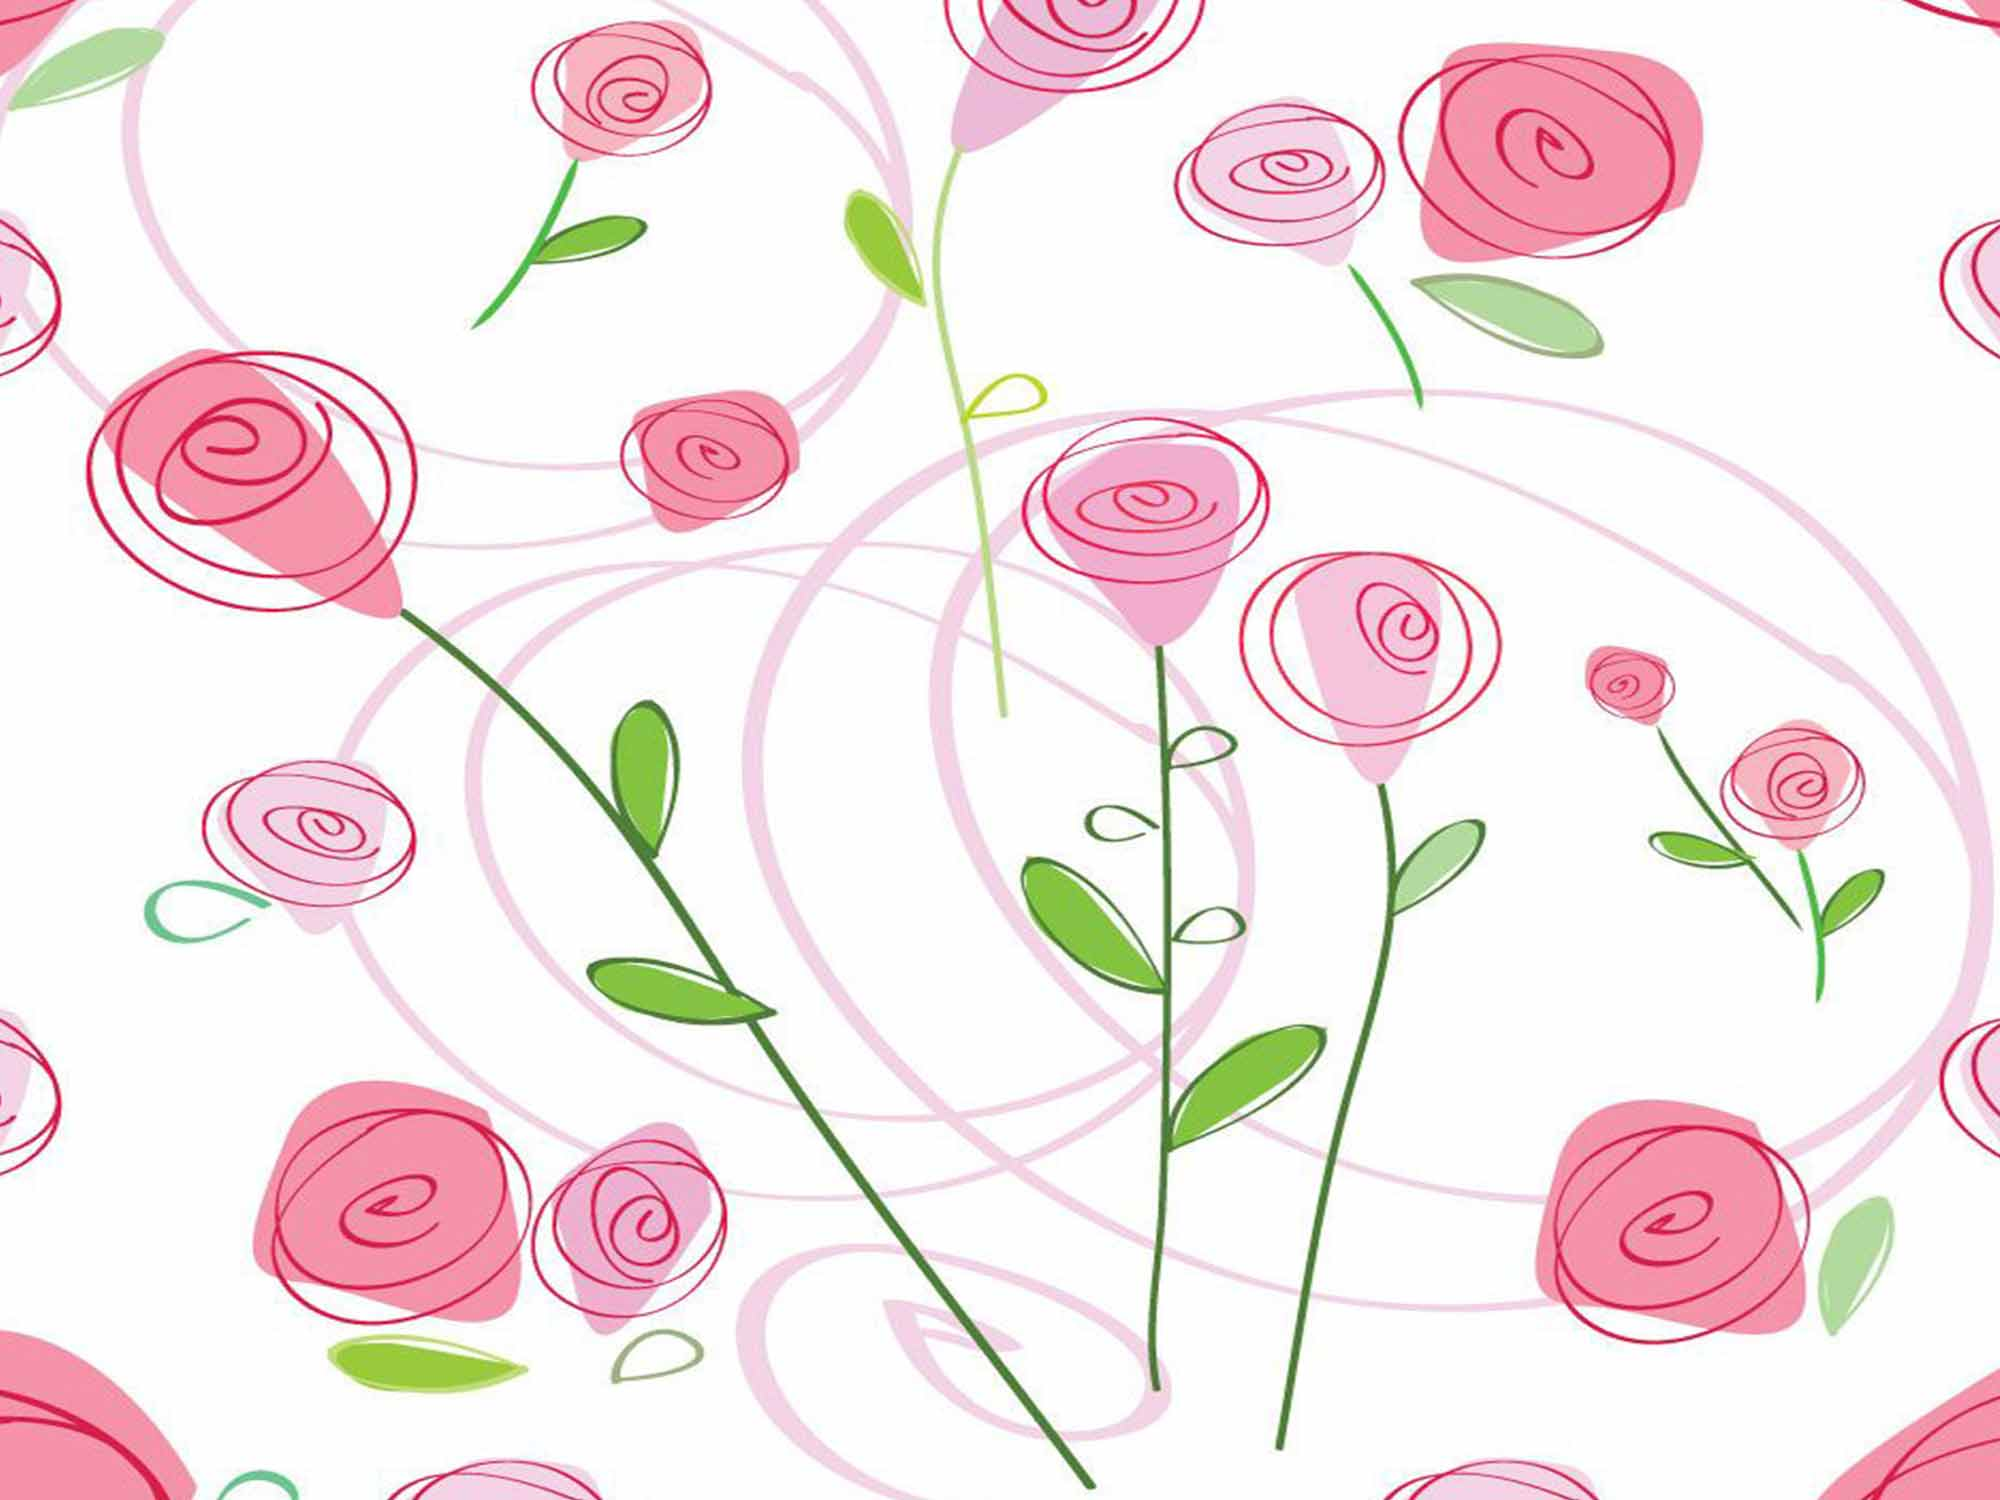 Papel de Parede Floral 0042 - Adesivos de Parede  - Paredes Decoradas